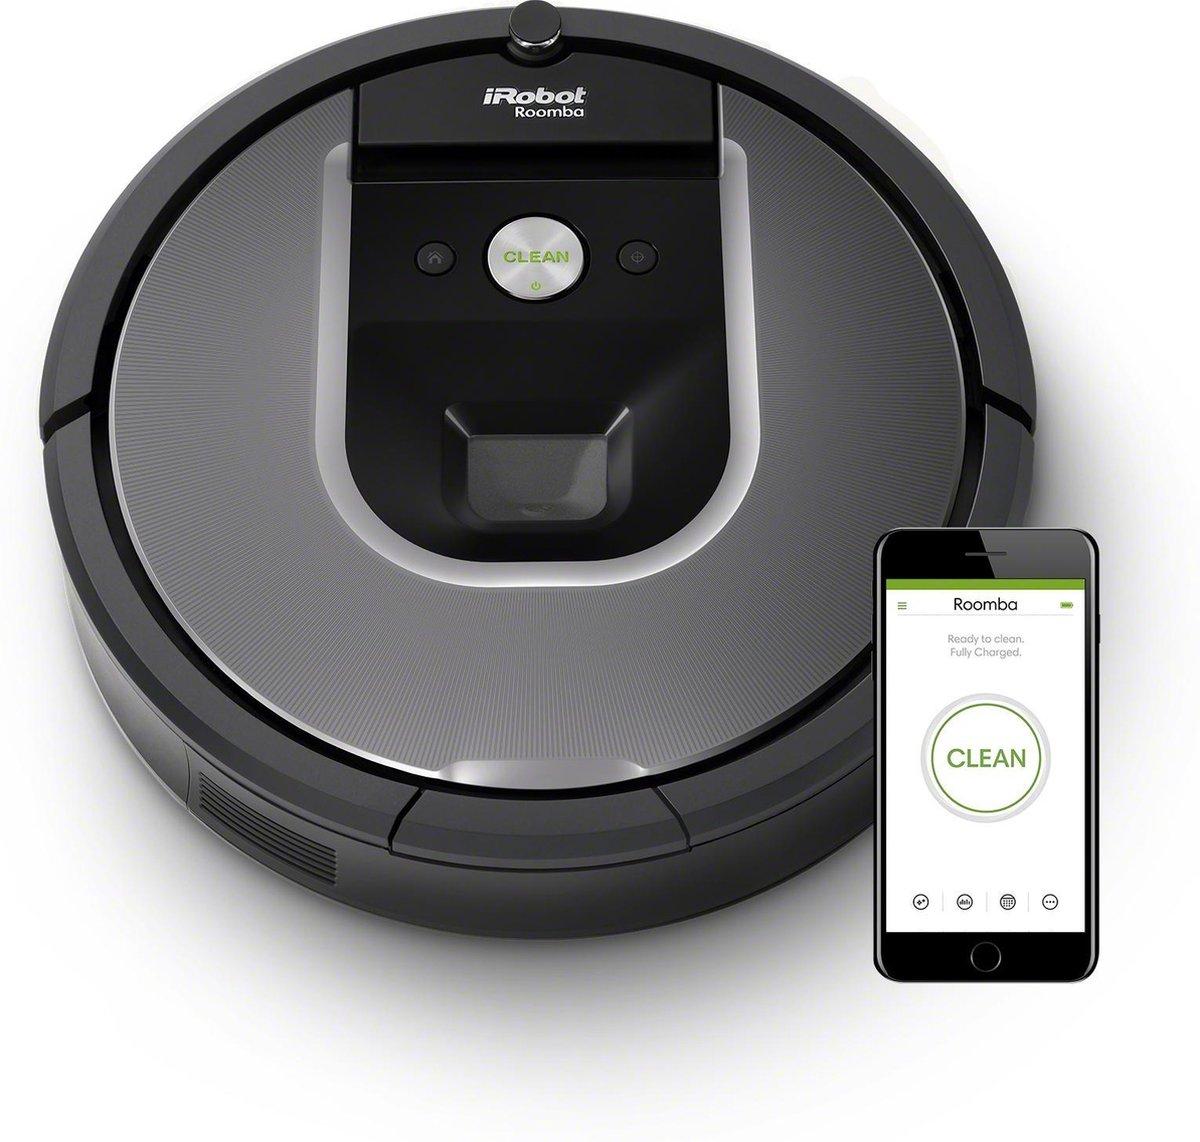 iRobot Roomba 960 - Robotstofzuiger, grijs @Amazon.nl